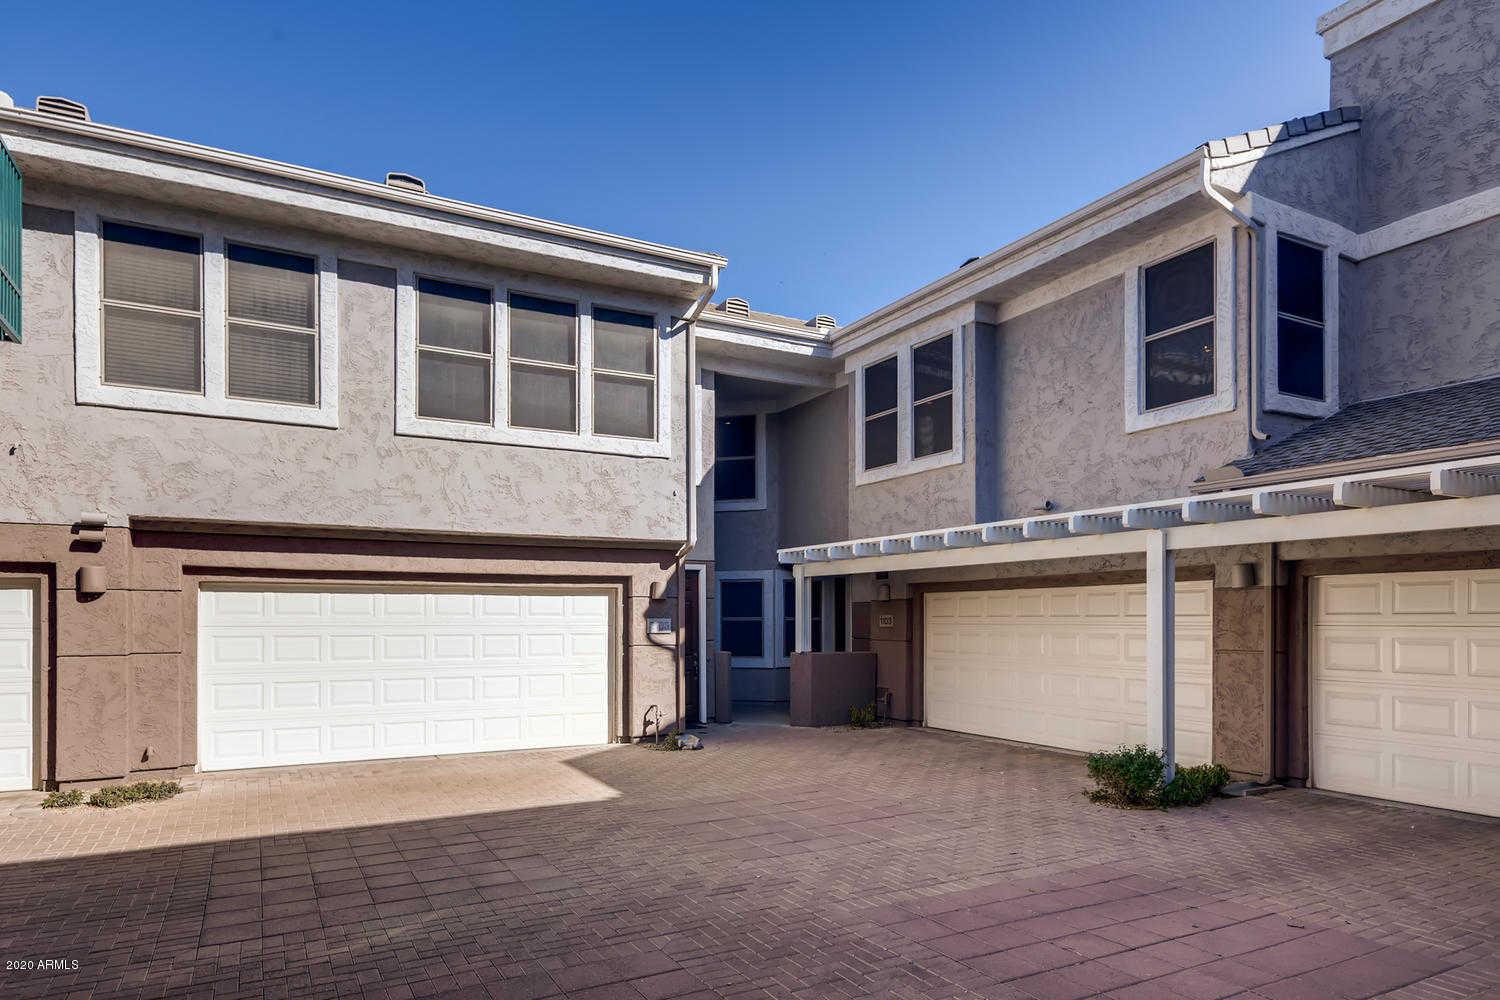 $499,000 - 3Br/2Ba -  for Sale in Kierland Greens Condominiums Amd, Scottsdale